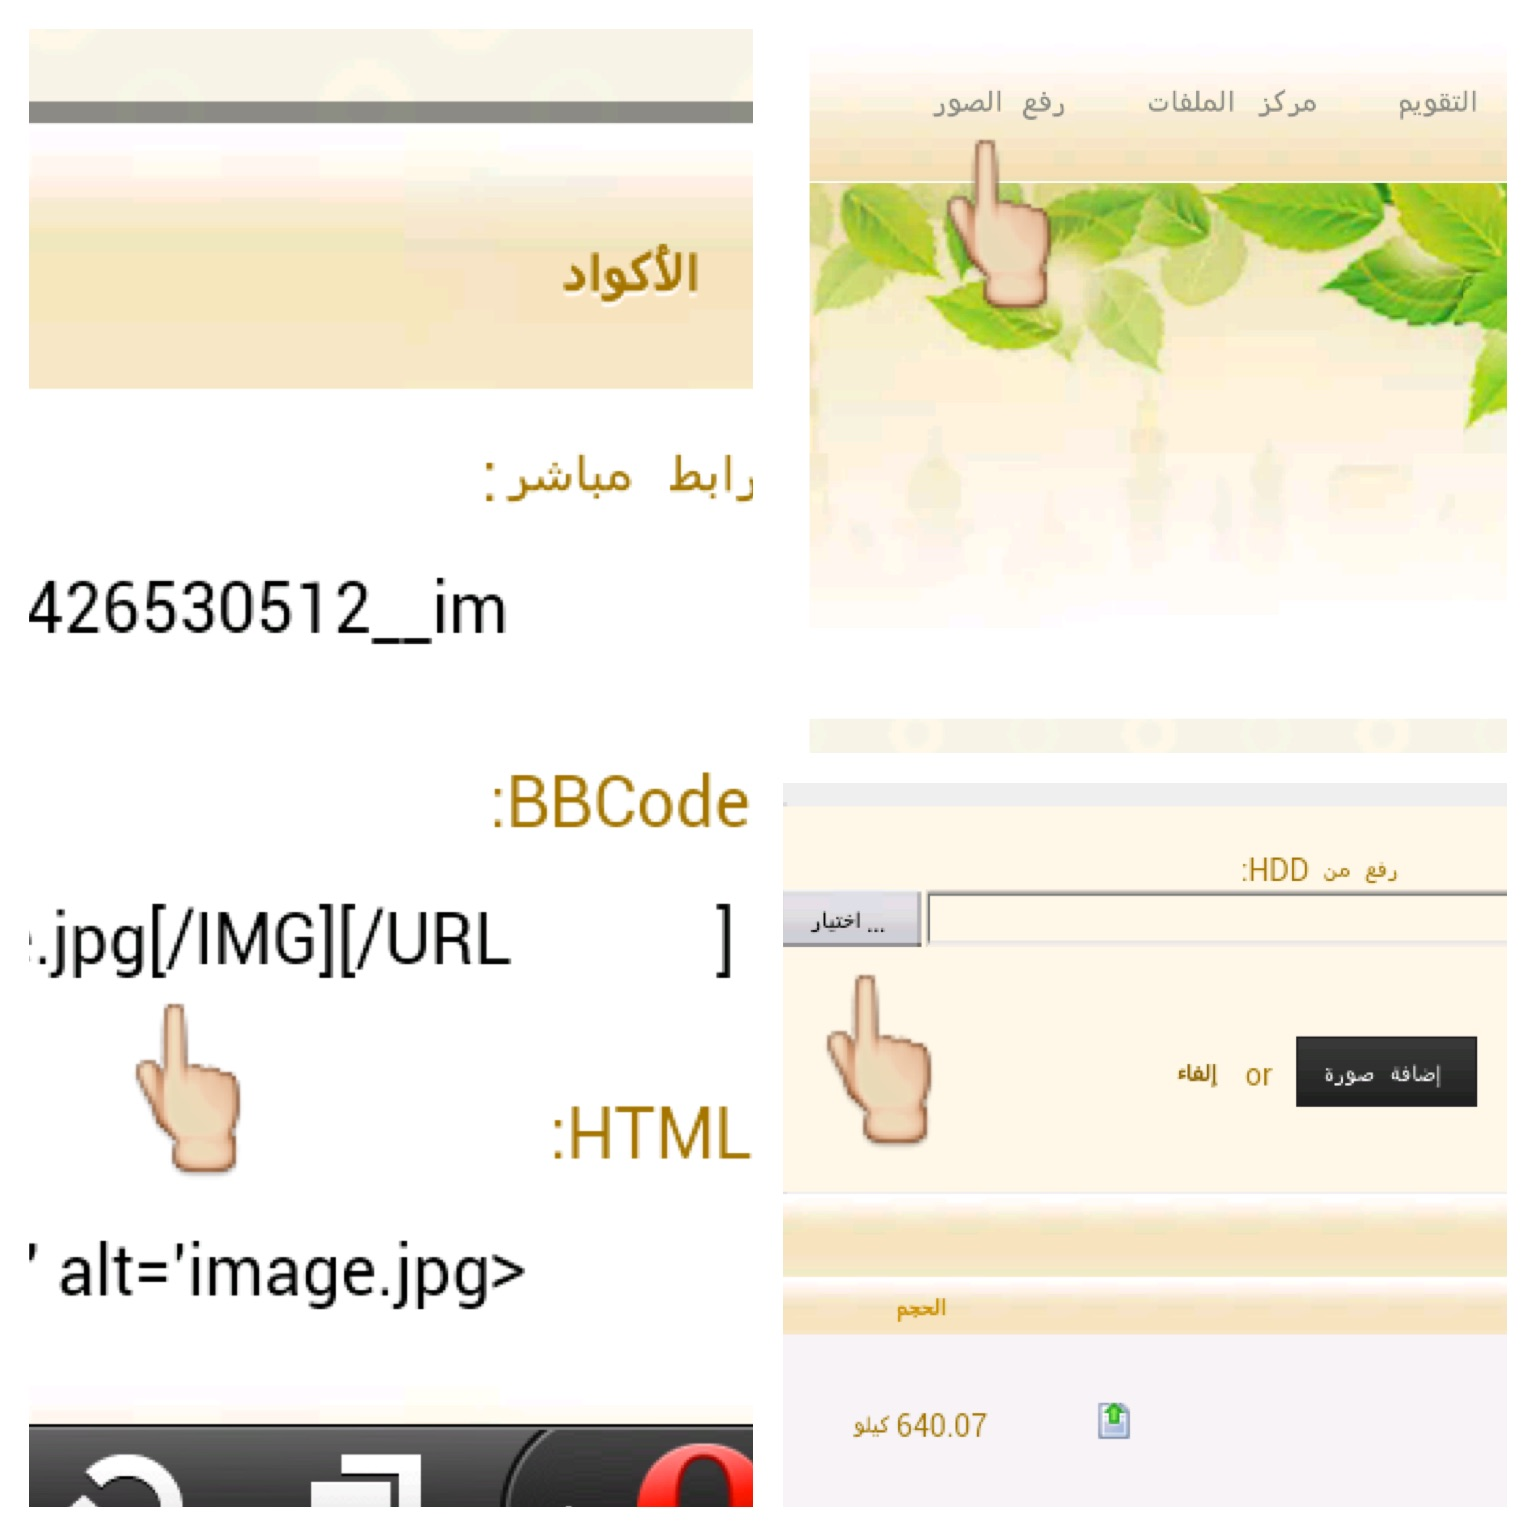 akhawat_islamway_1427229414__image.jpg